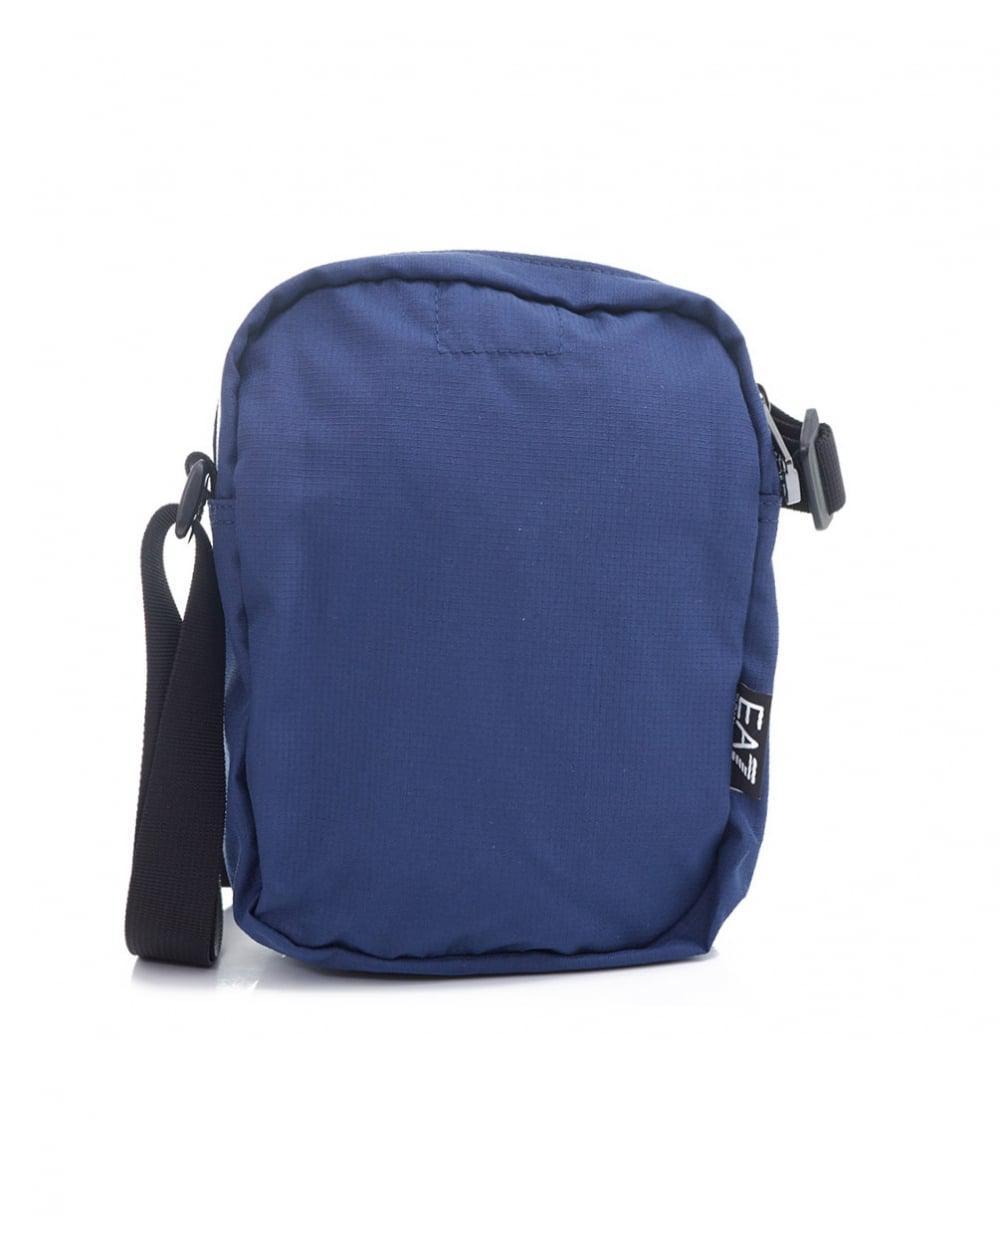 2d2612fcc371 EA7 Train Prime Metallic Logo Pouch Bag in Blue for Men - Lyst